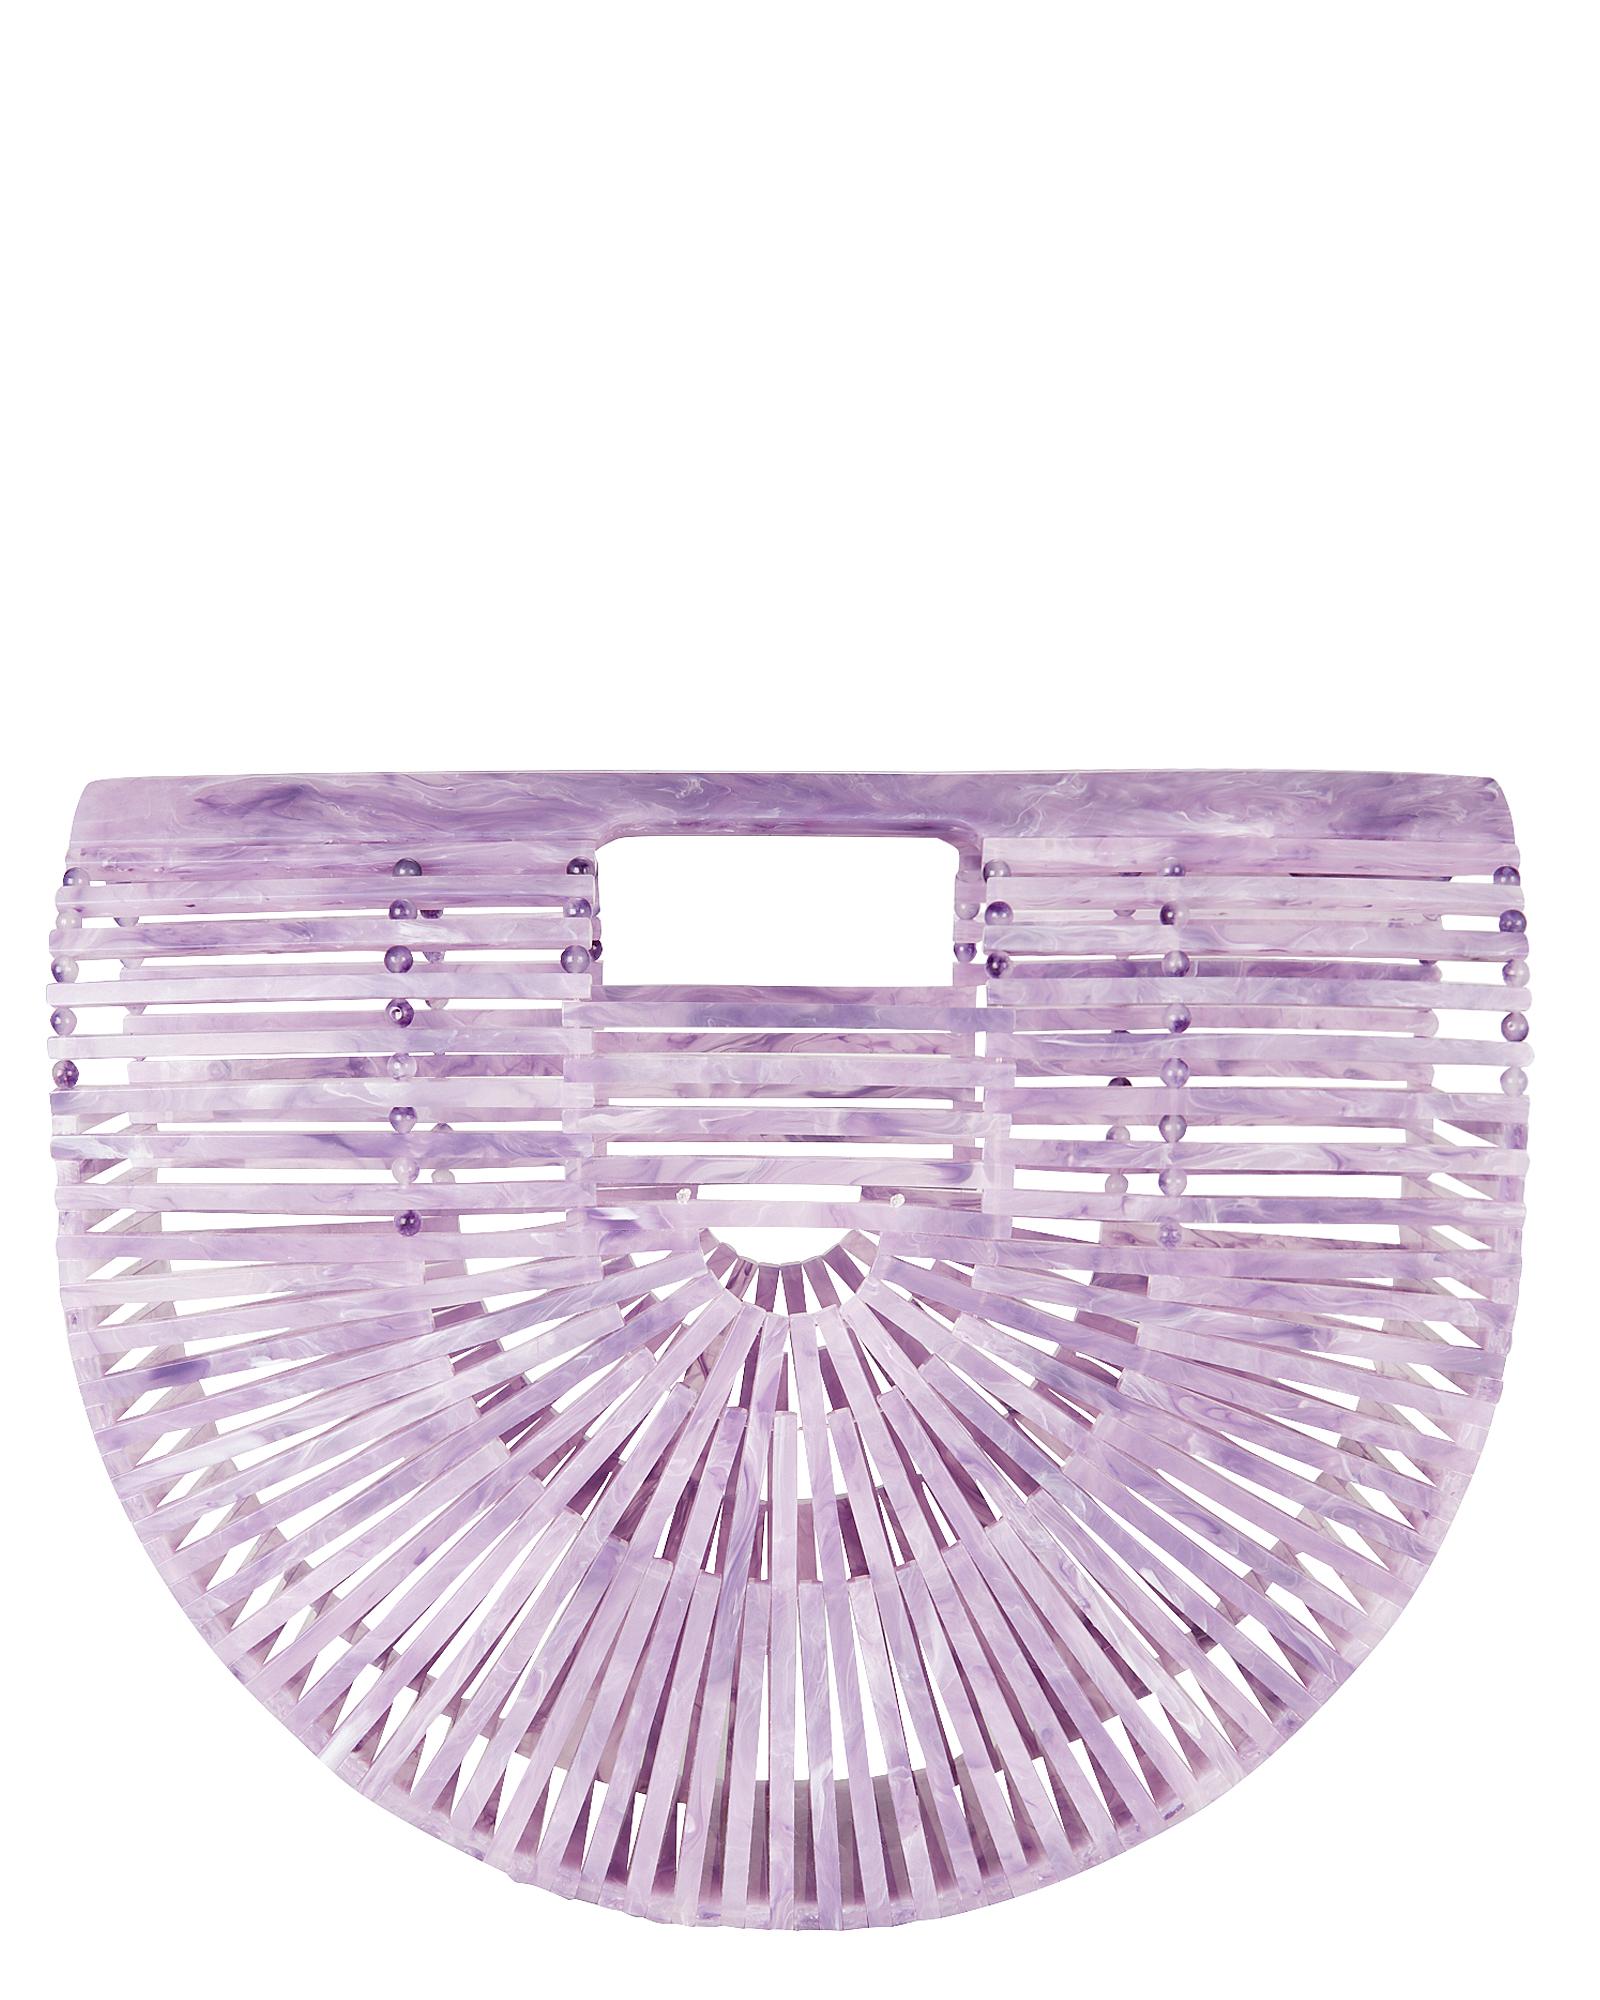 Ark Small Half Lavender Bag by Cult Gaia